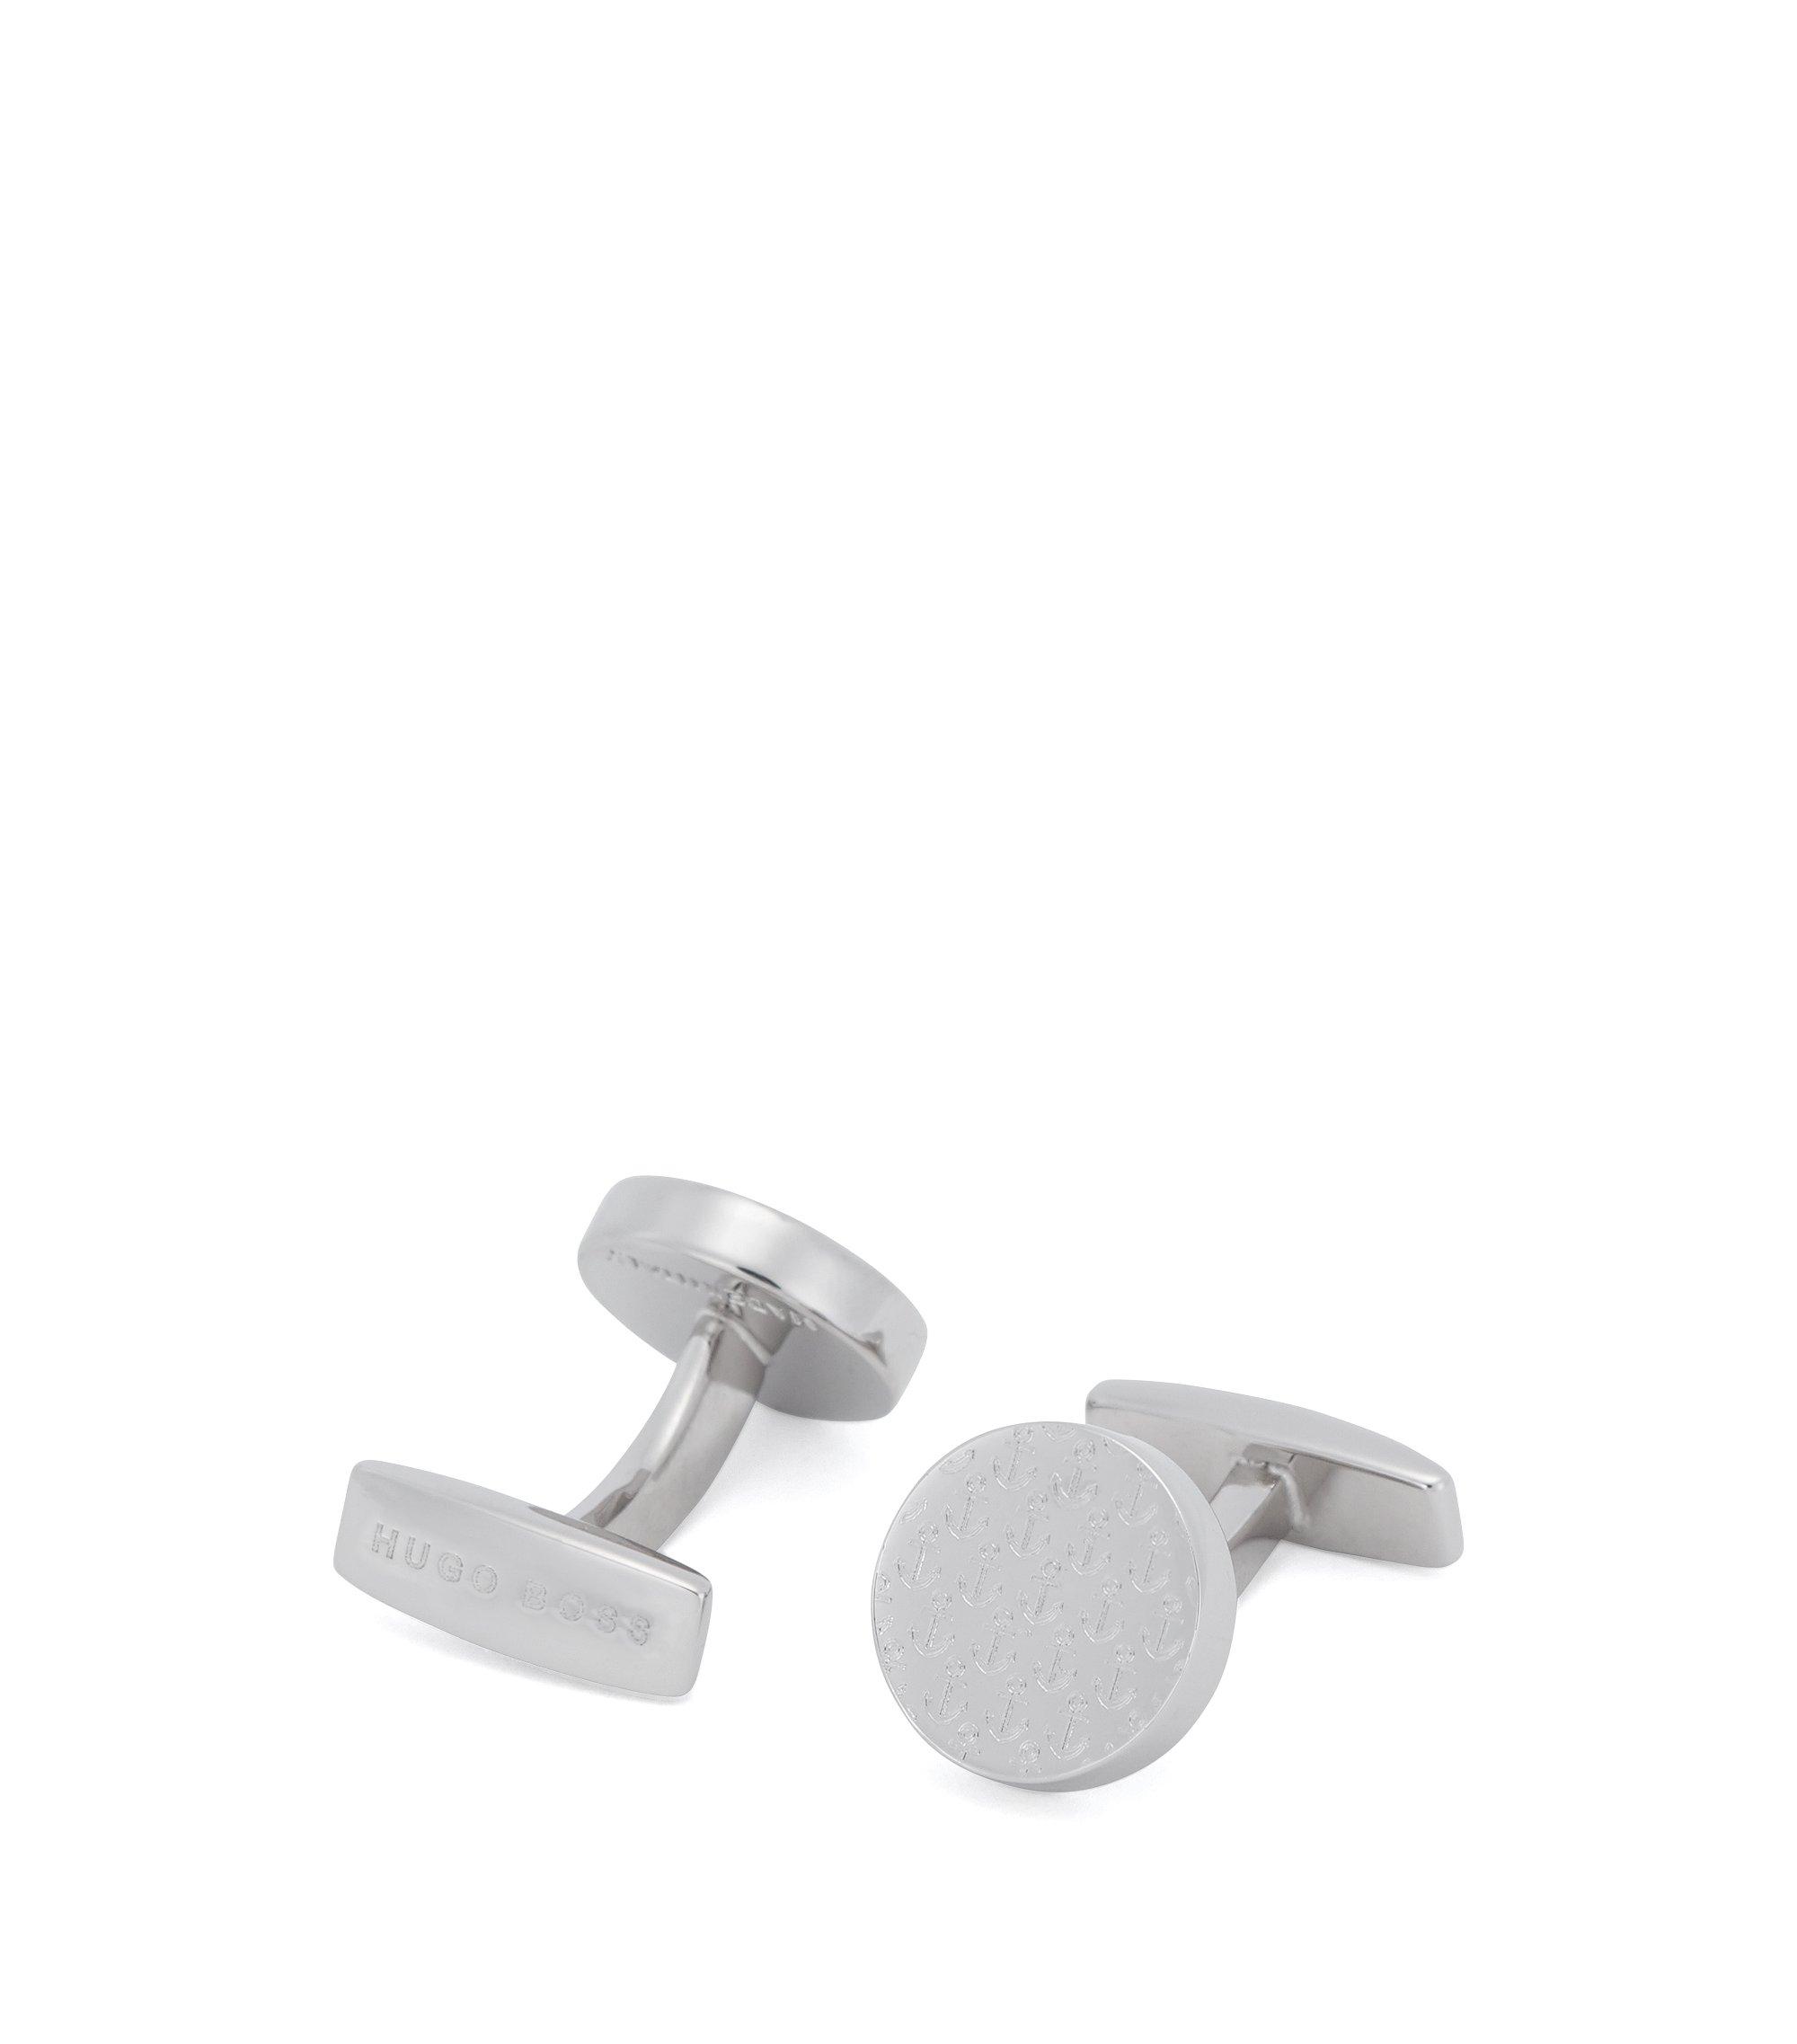 Round cufflinks with an anchor design, Silver